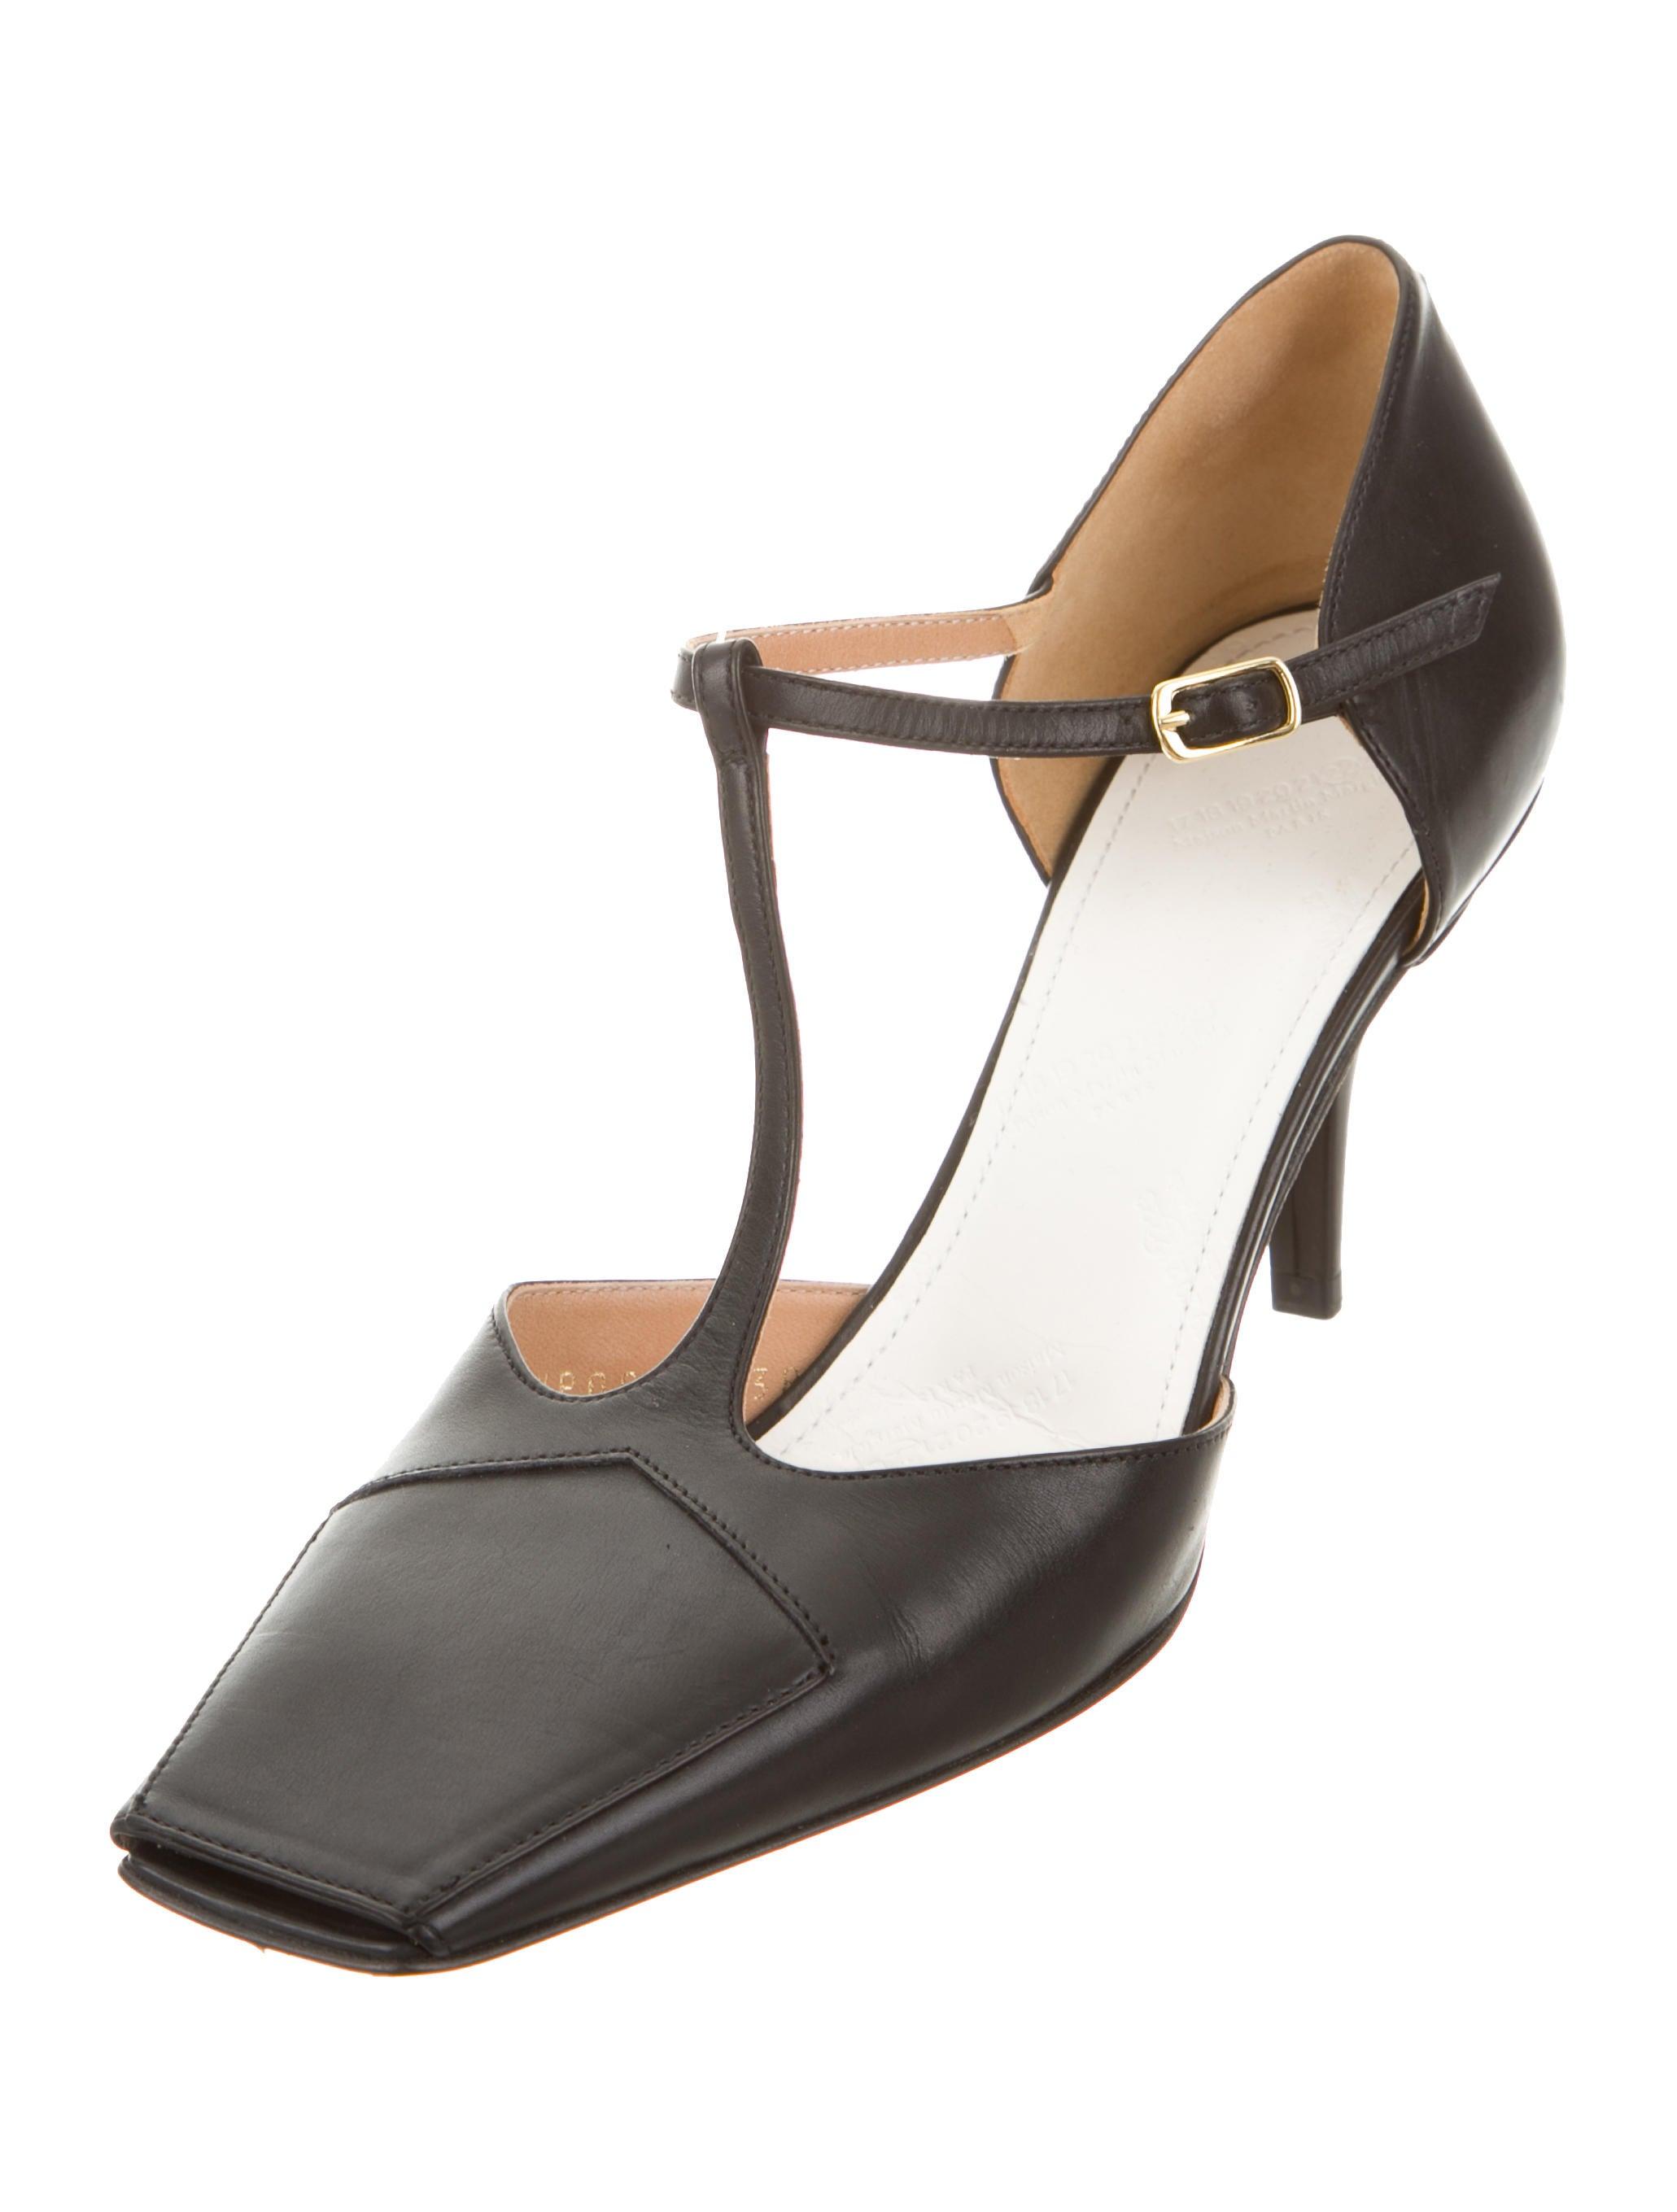 maison margiela leather t strap pumps shoes mai28758 the realreal. Black Bedroom Furniture Sets. Home Design Ideas